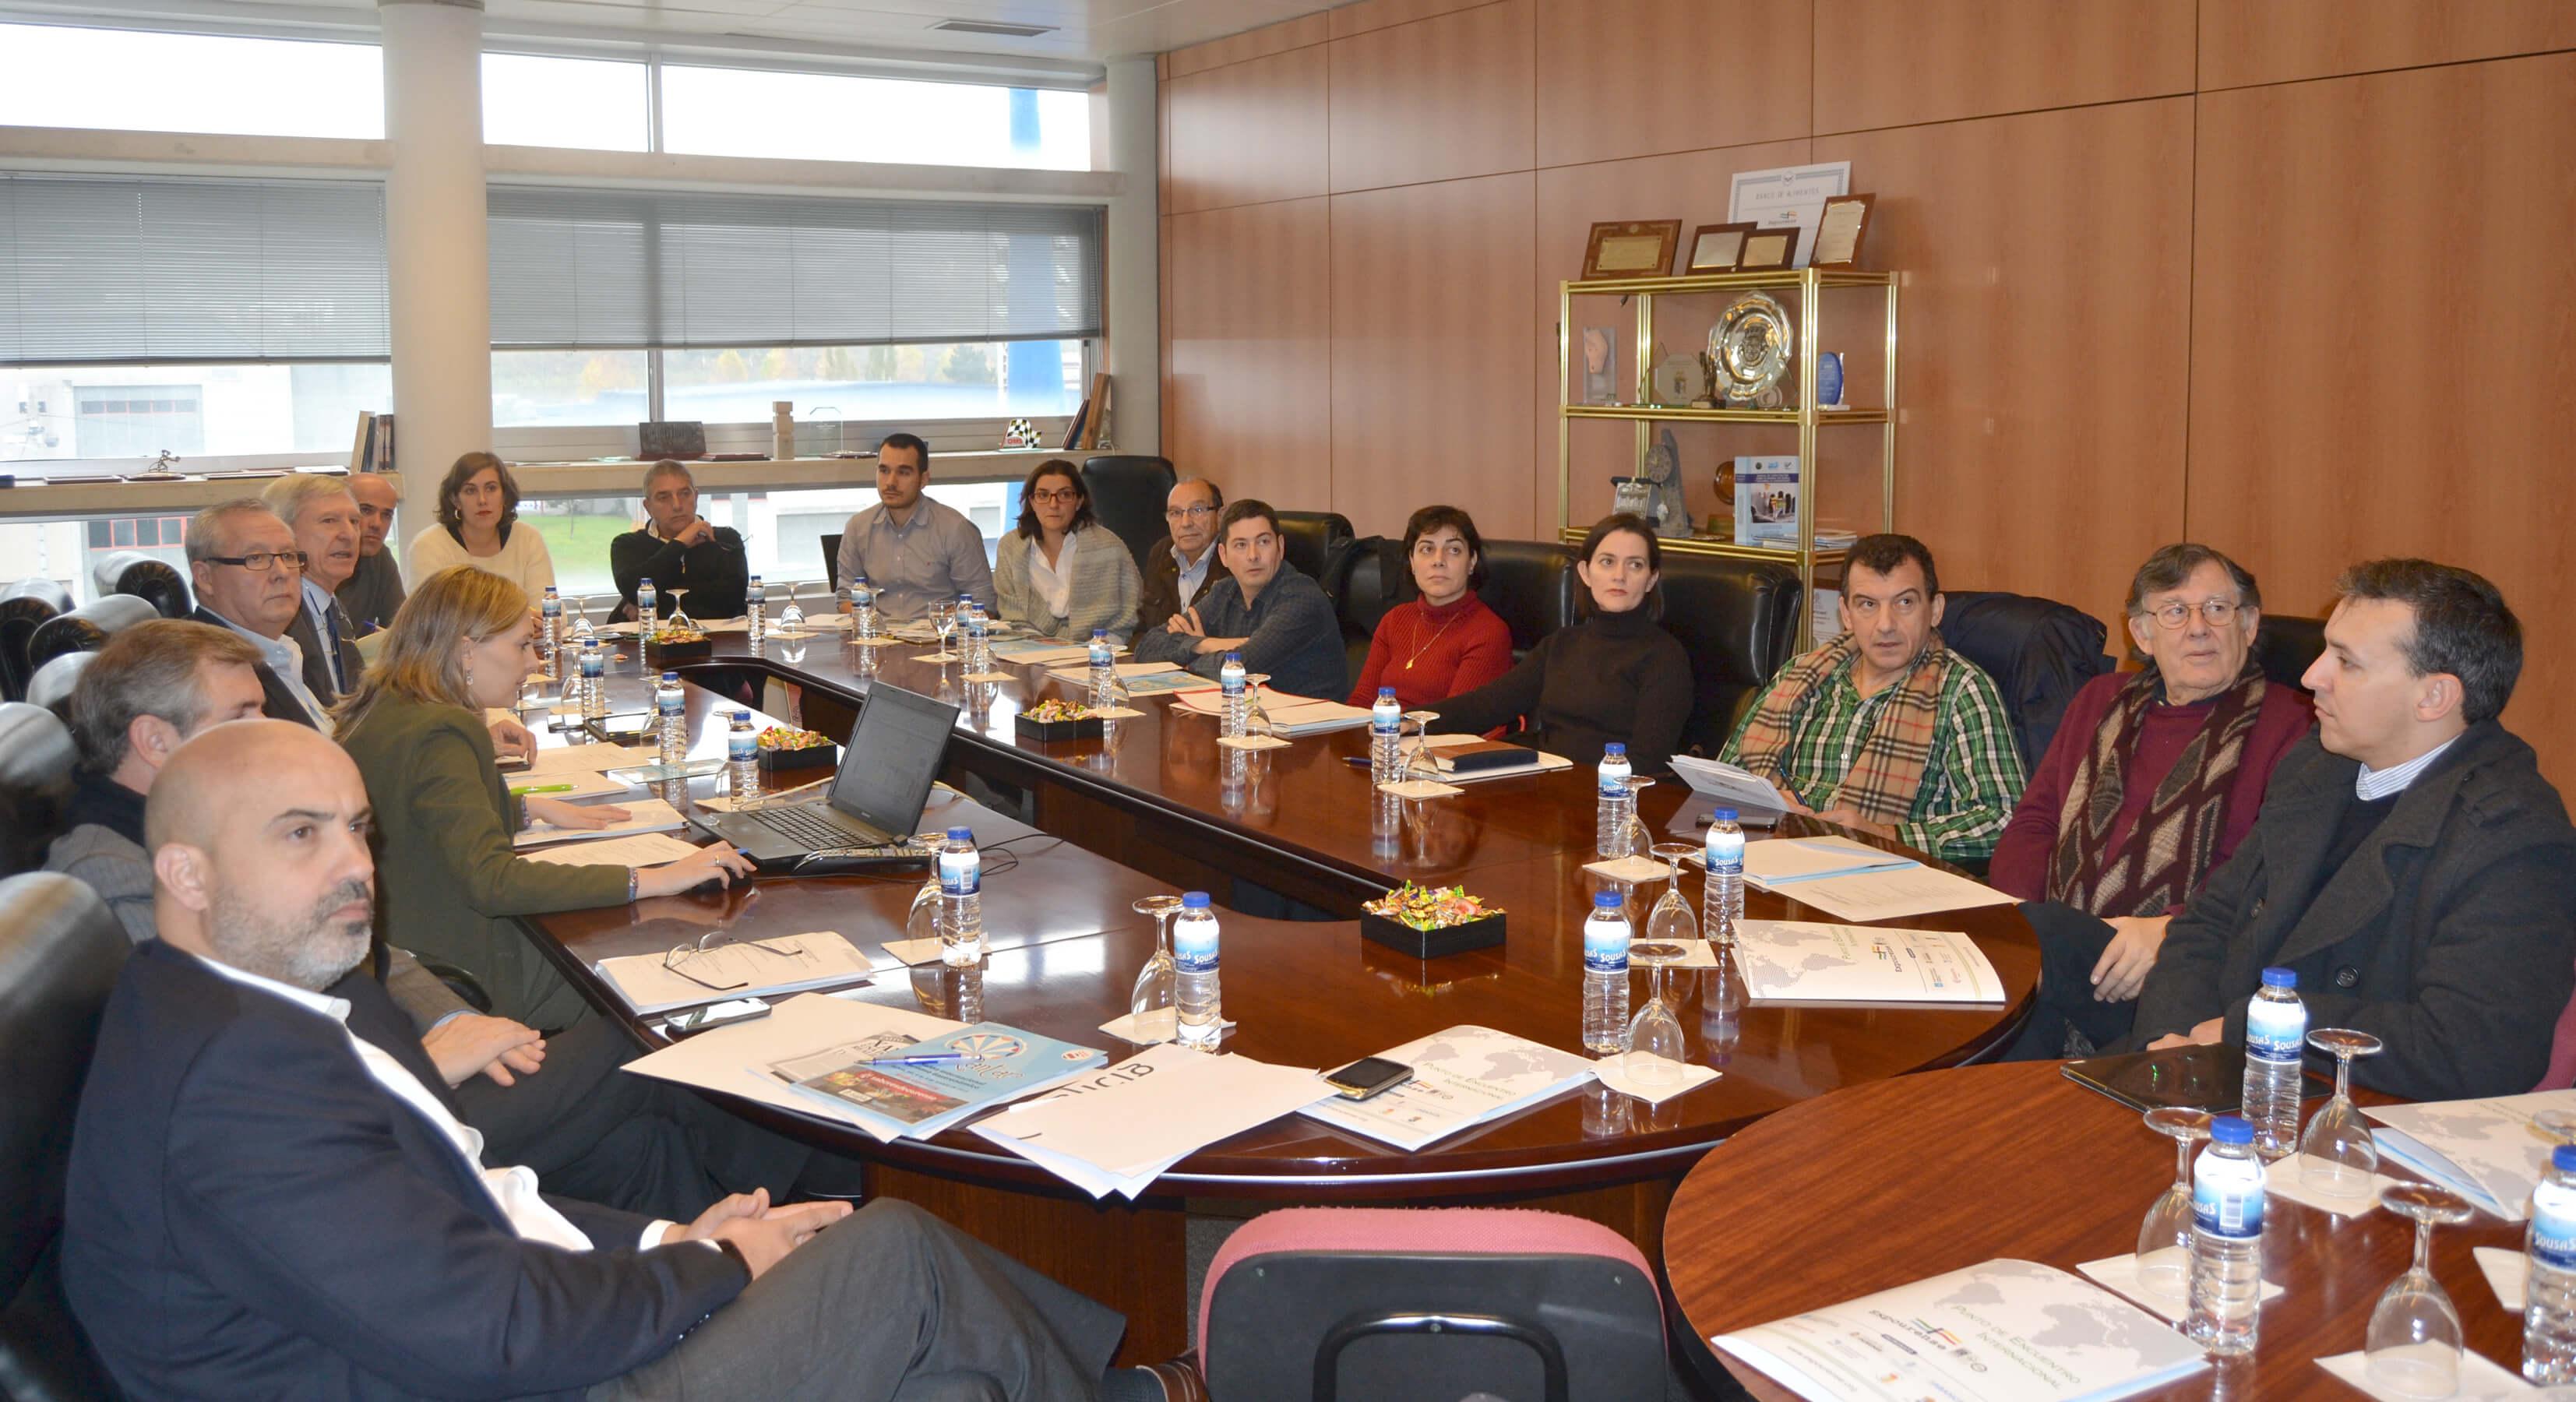 Primera reunión del comité asesor de Xantar 2016